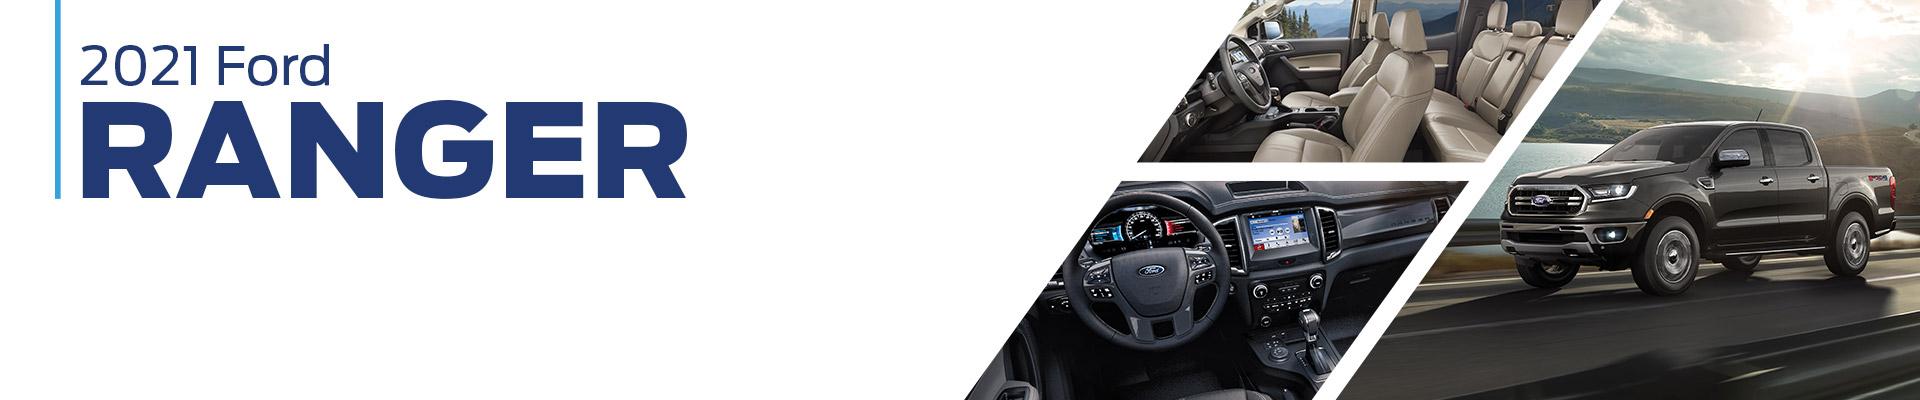 2021 Ford Ranger - Sun State Ford - Orlando, FL